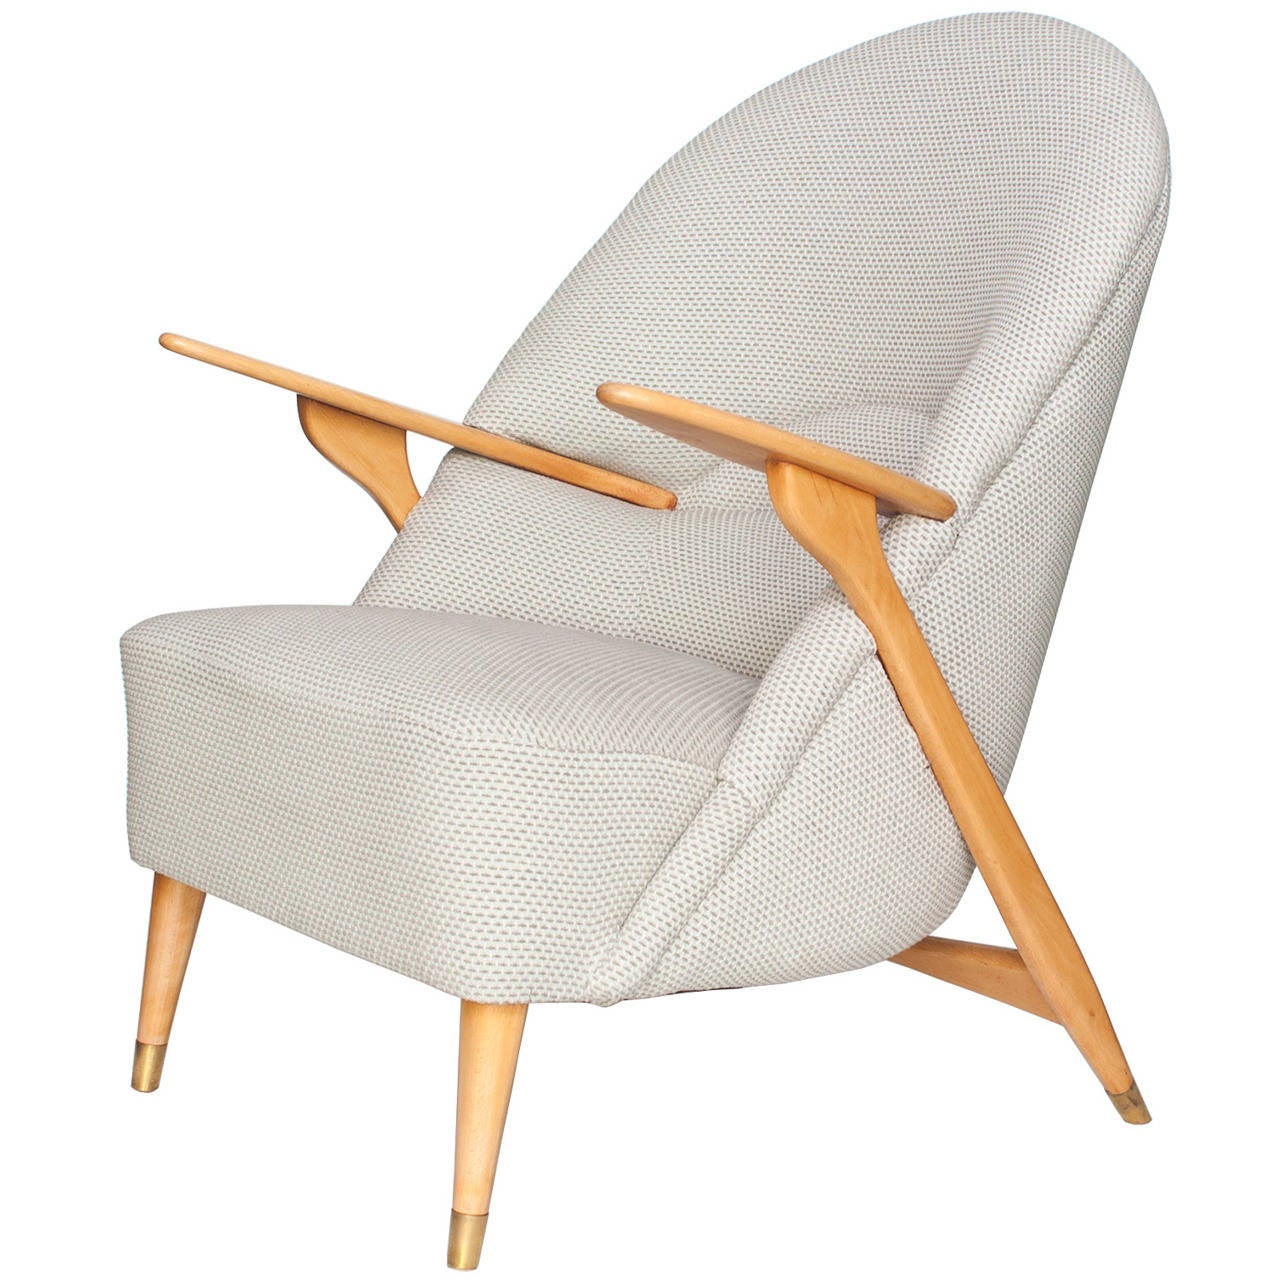 Danish Designer Mid Century Lounge Chair With Beechwood Frame At 1stdibs